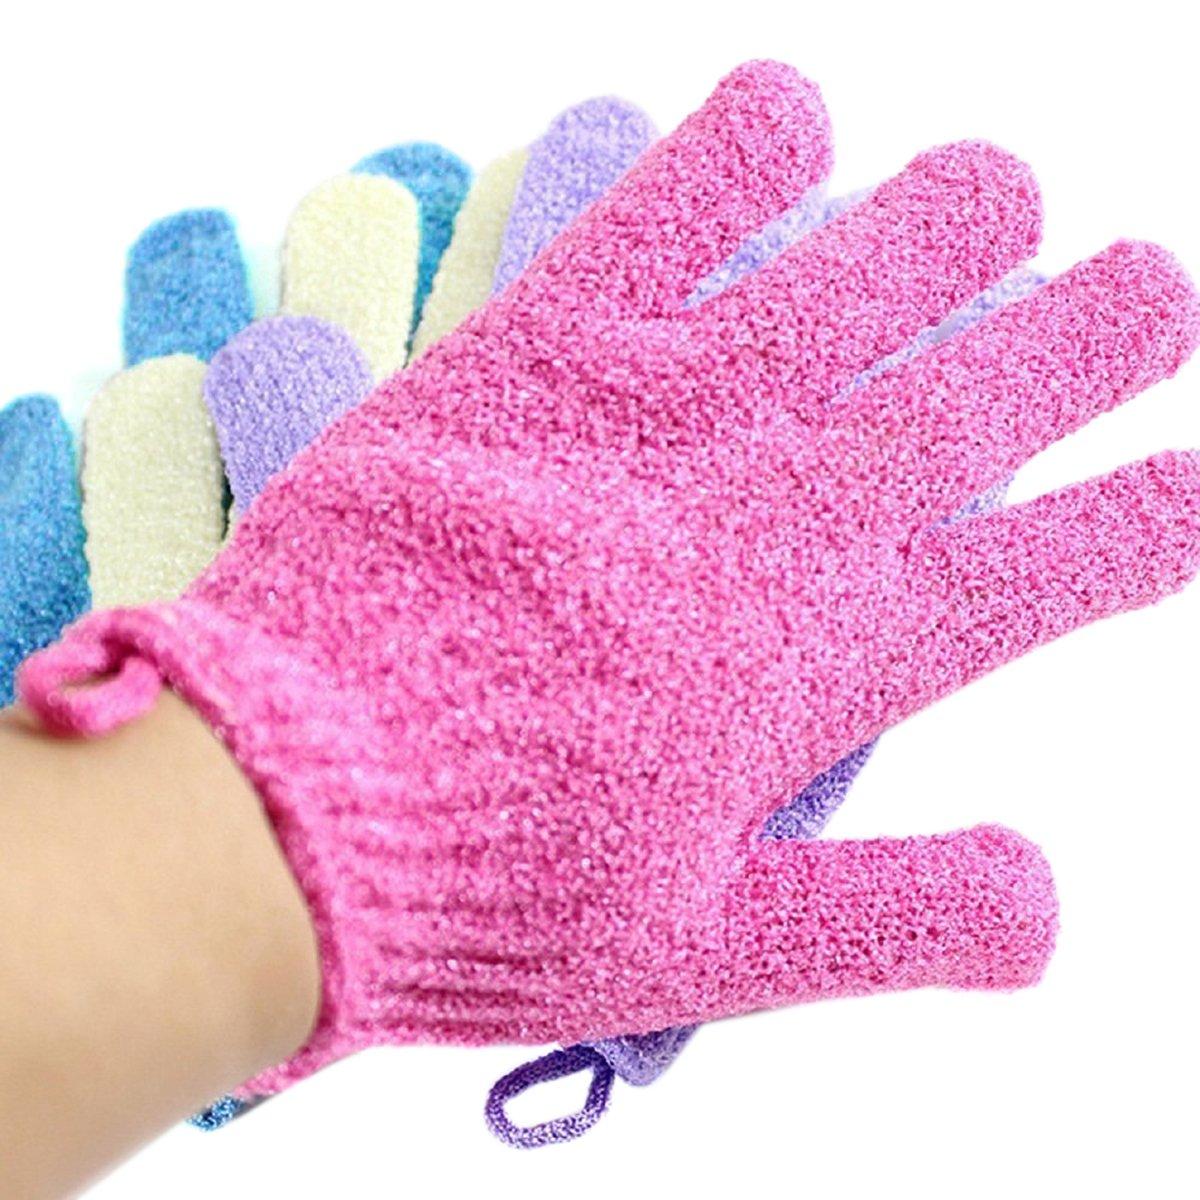 Moonmini® 4 Pair Set Scrubbing Exfoliating Gloves ★ Double Side Durable Nylon Shower Gloves ★ Body Scrub Exfoliator for Men, Women & Kids ★ Bath Scrubber for Acne & Dead Cell